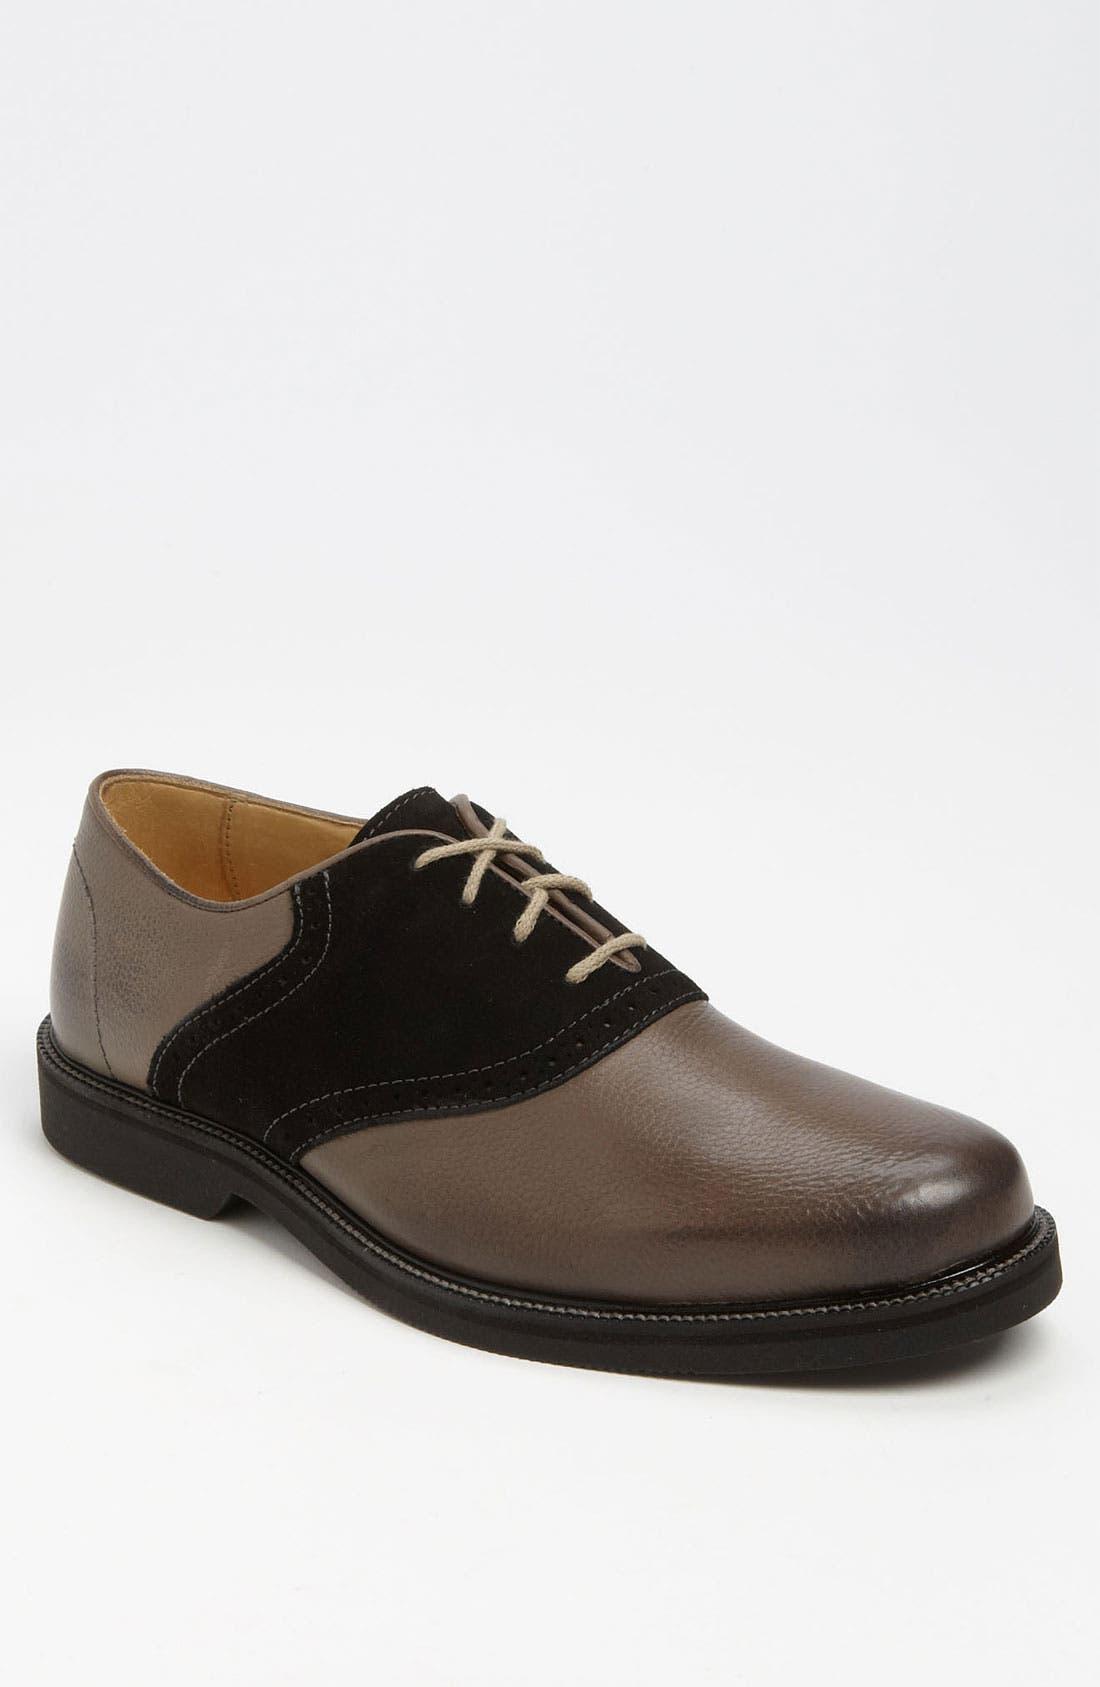 Main Image - 1901 'Bennett' Saddle Shoe (Men)